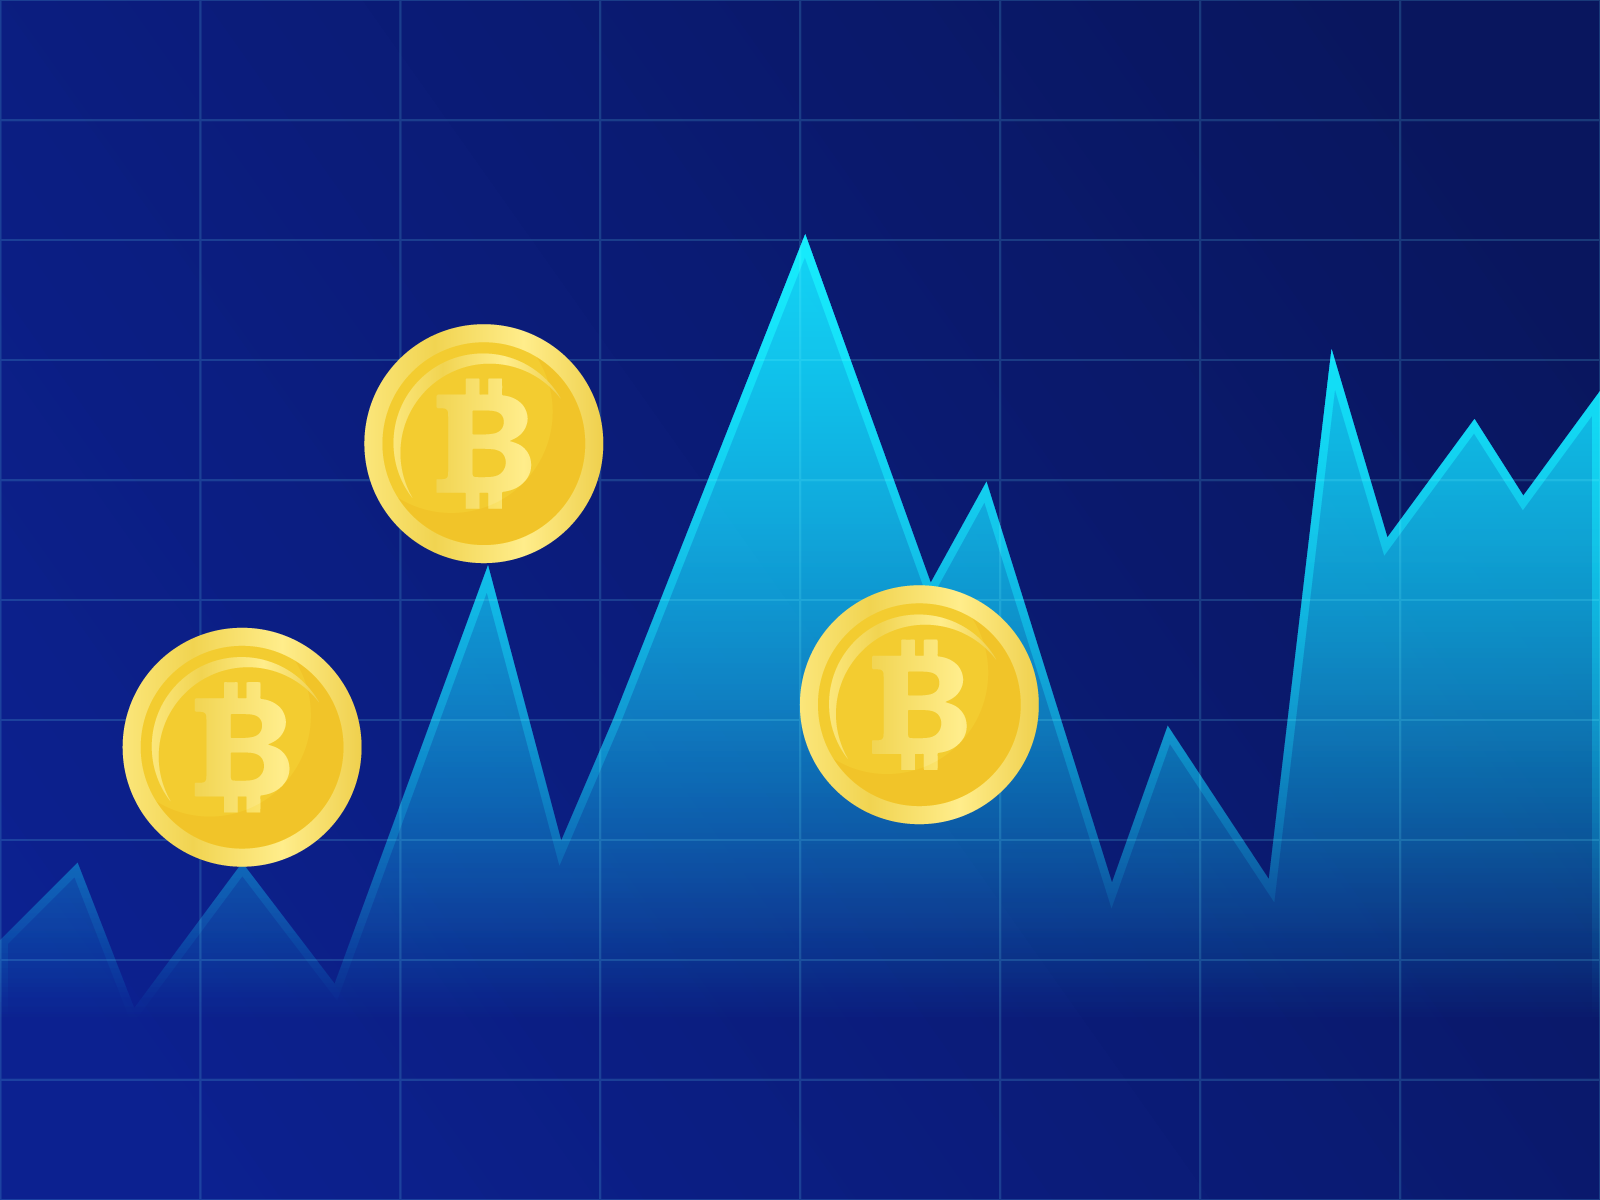 Graph showing bitcoin volatility